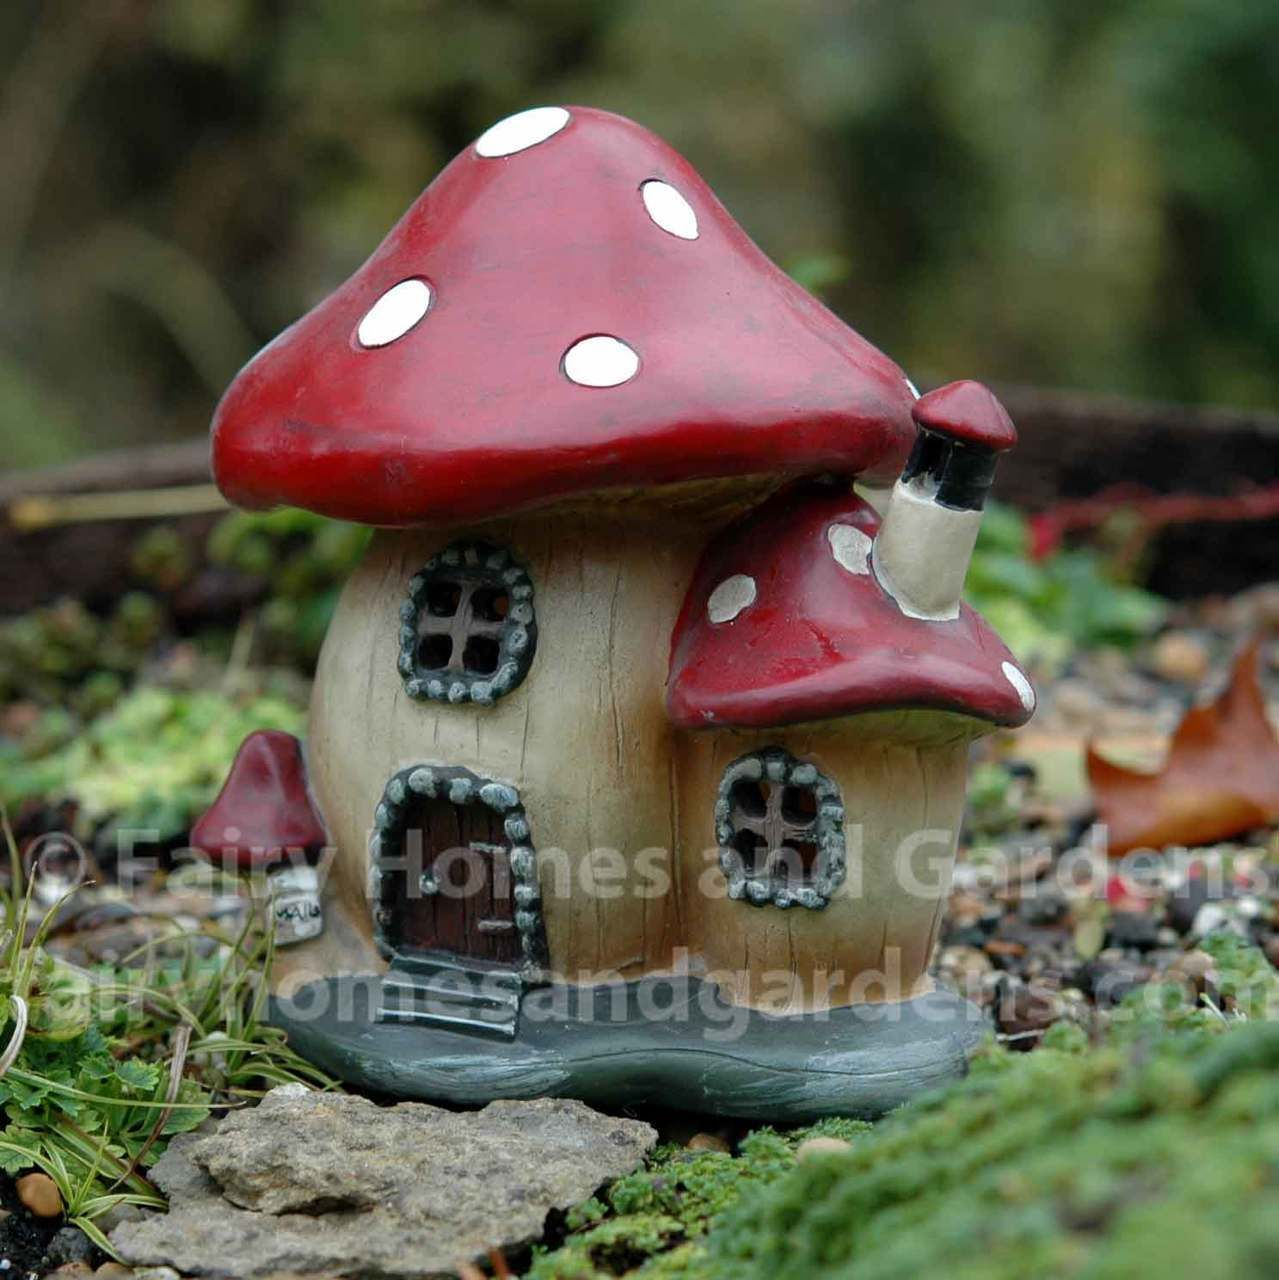 Gnome Garden: Miniature Lighted Mushroom House